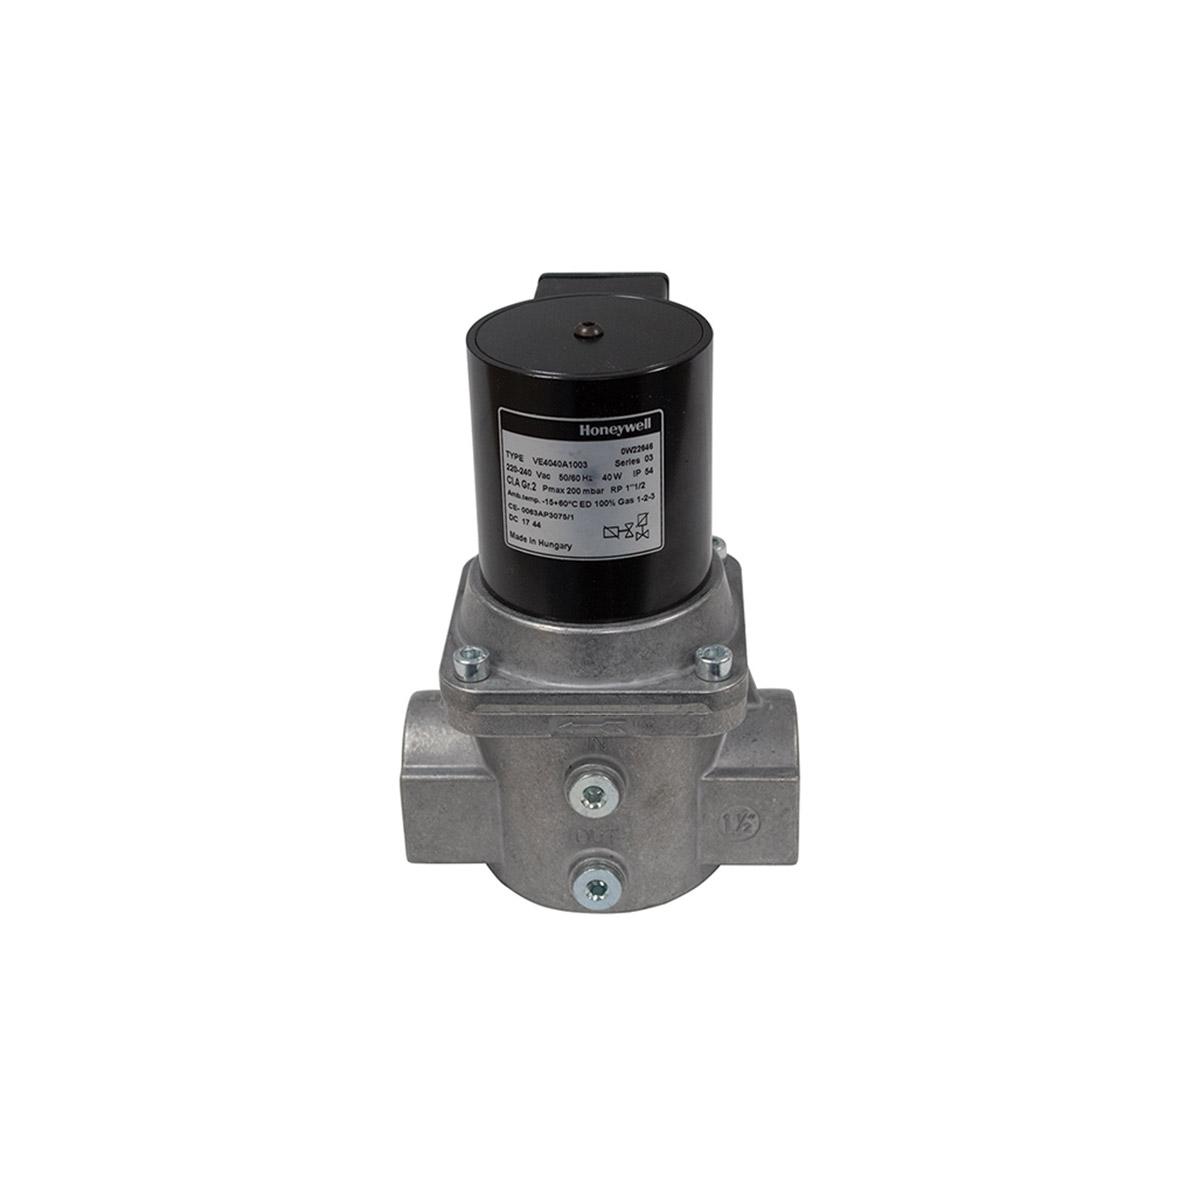 CaterGuard M-VE200 2-Inch Gas Solenoid Valve